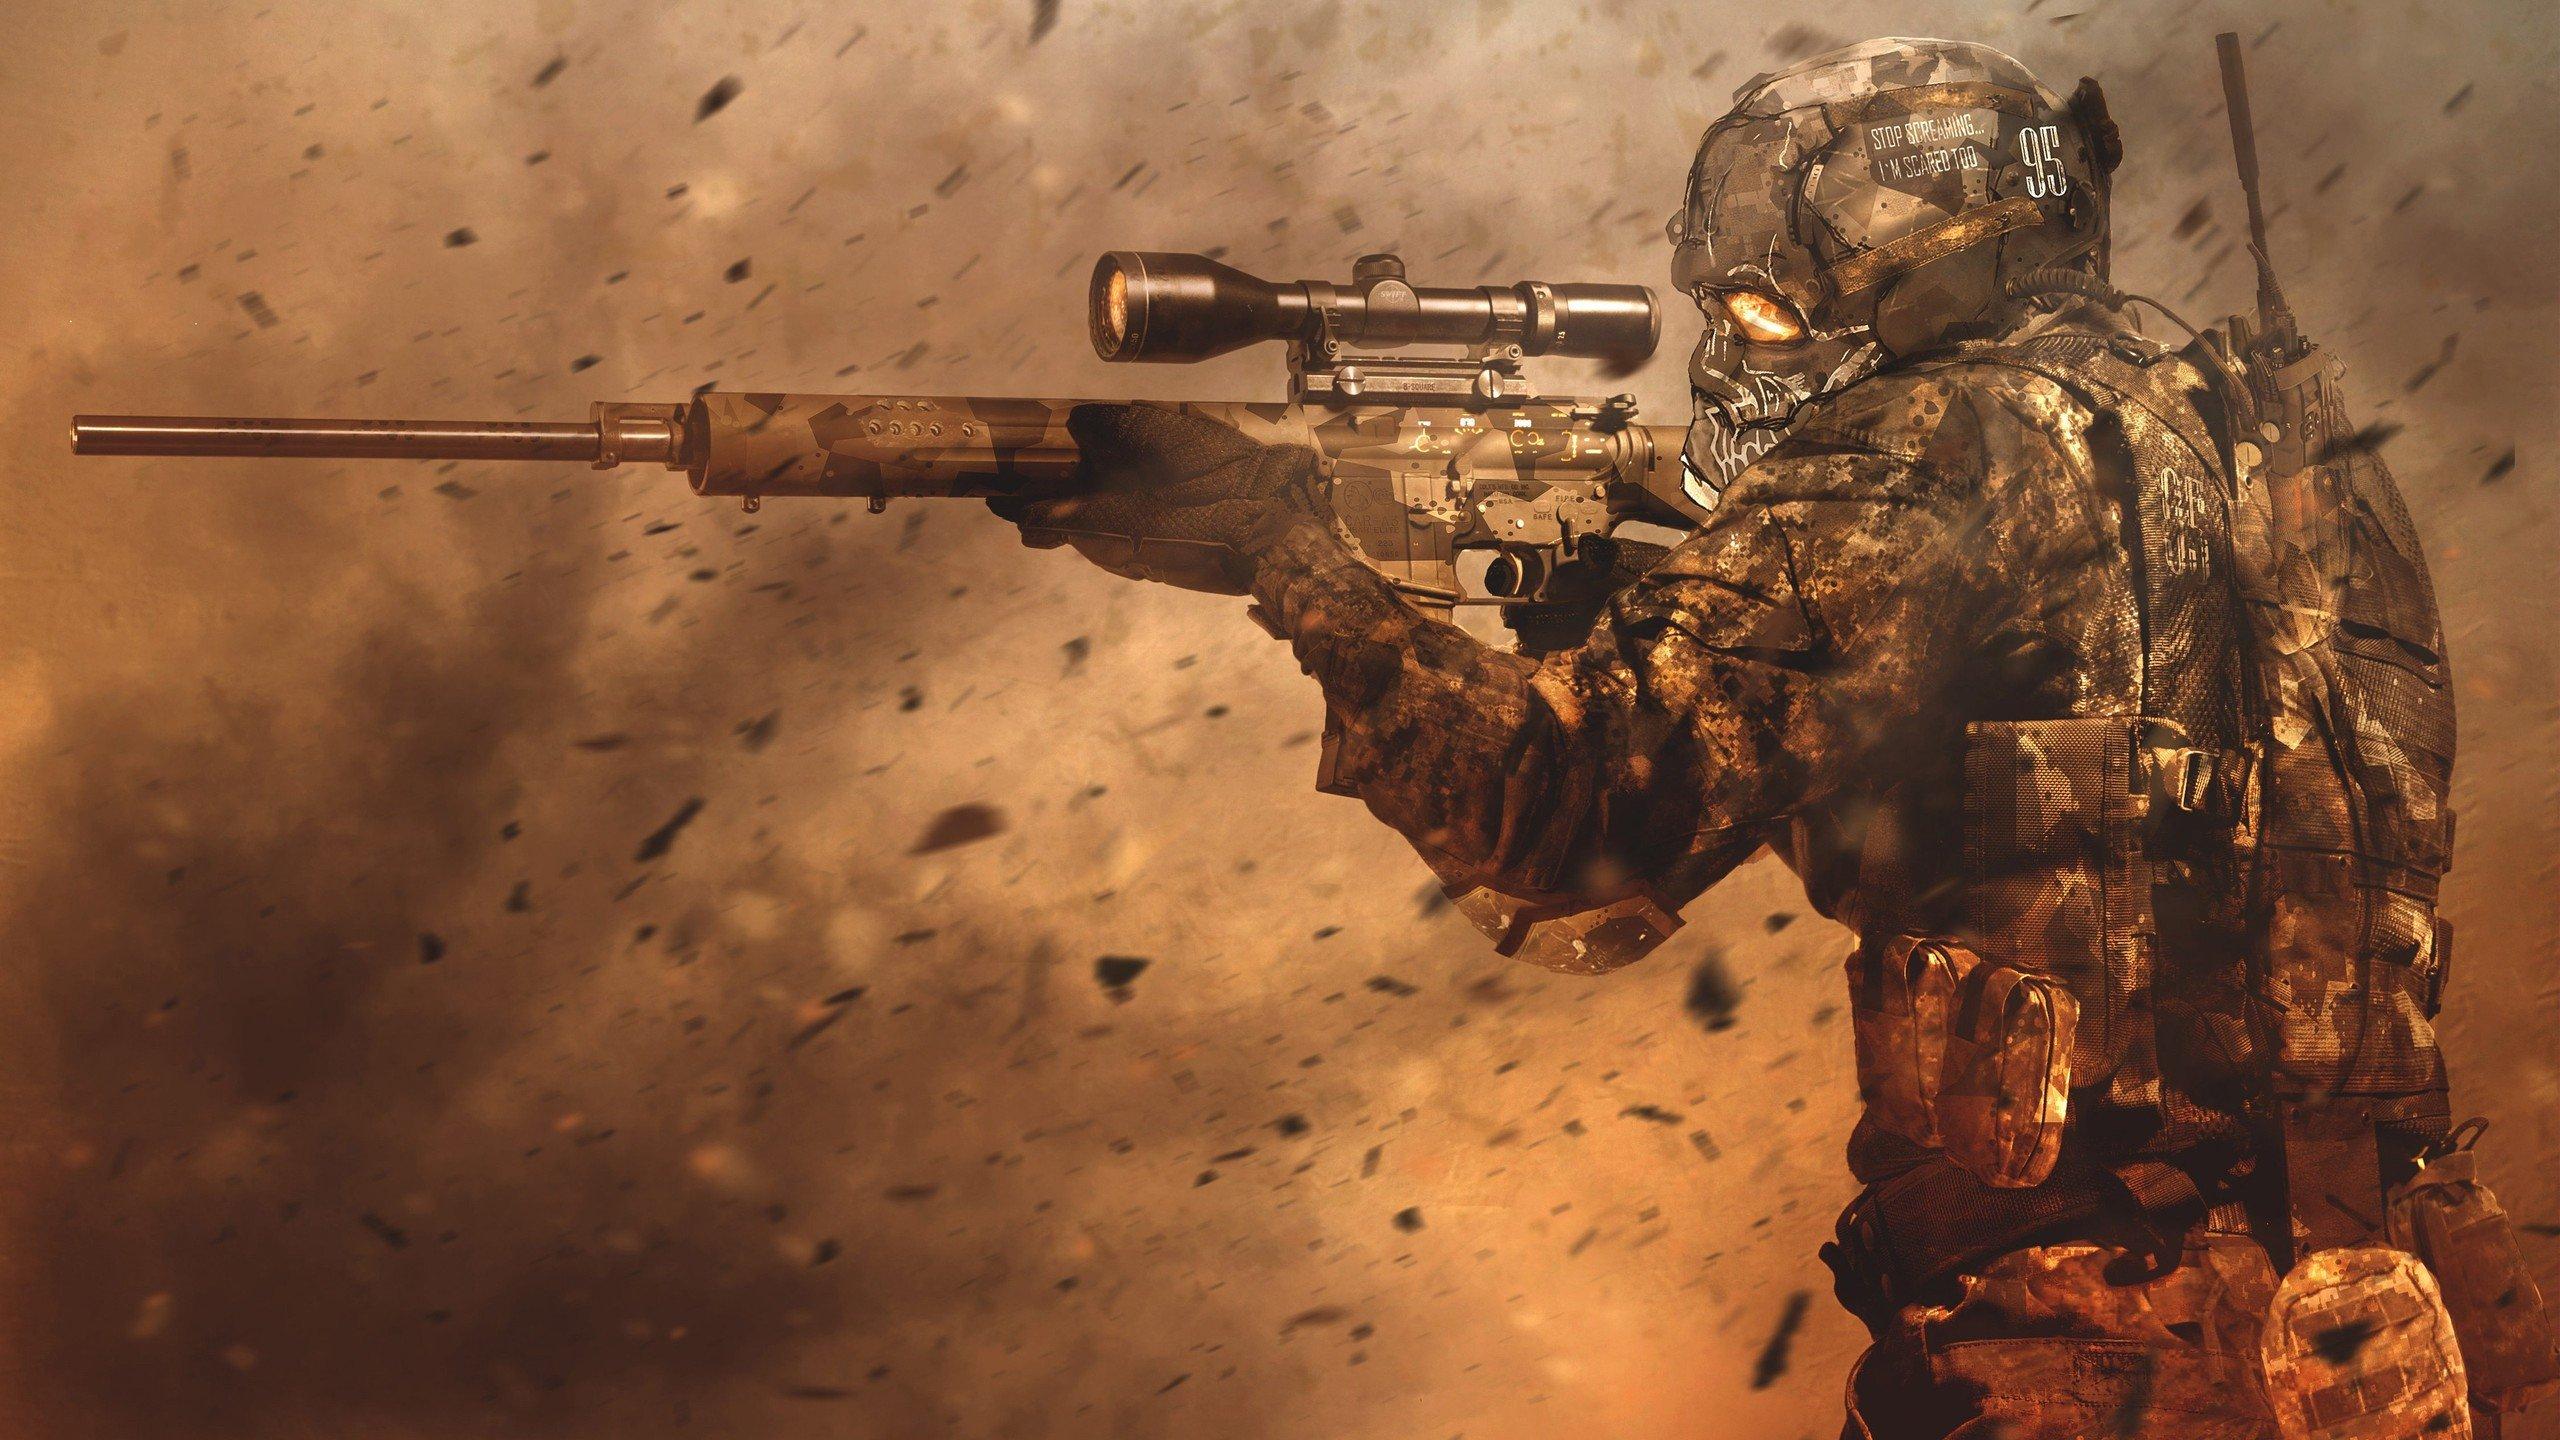 Call of Duty Oyunu 4K PC Duvar kağıdı